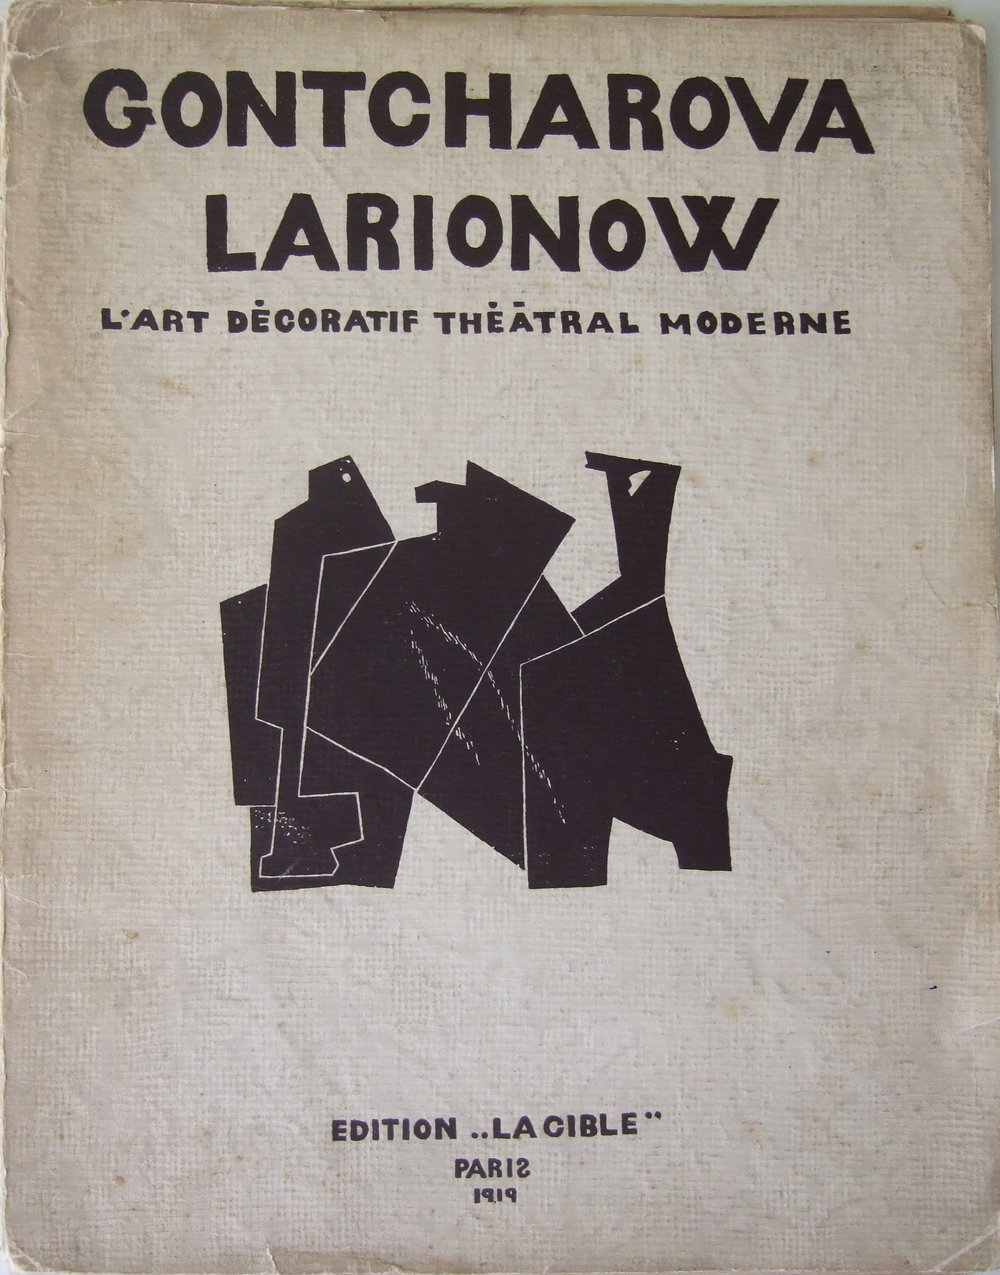 Gontcharova Larionow